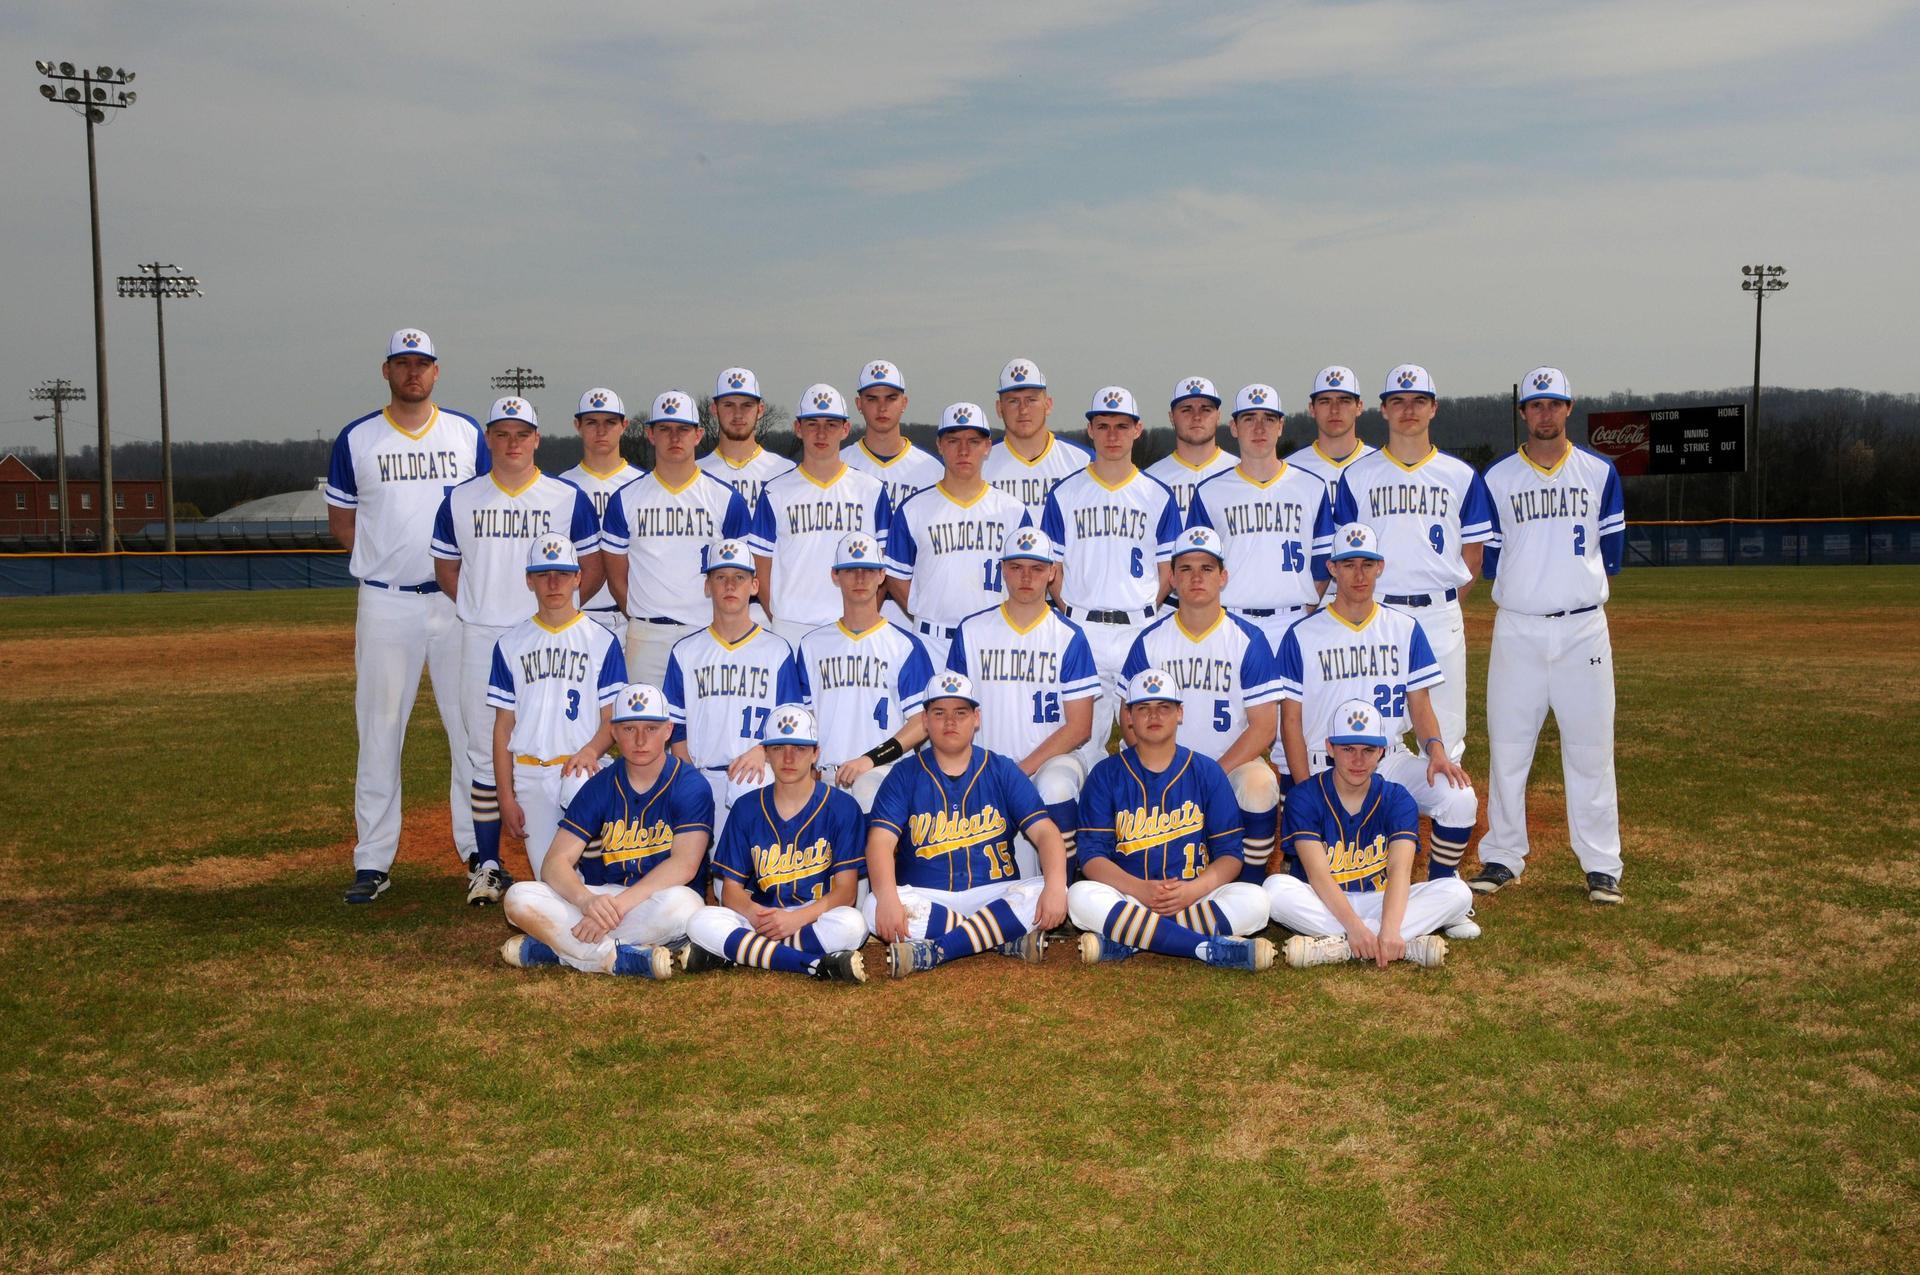 2017/2018 Baseball Team